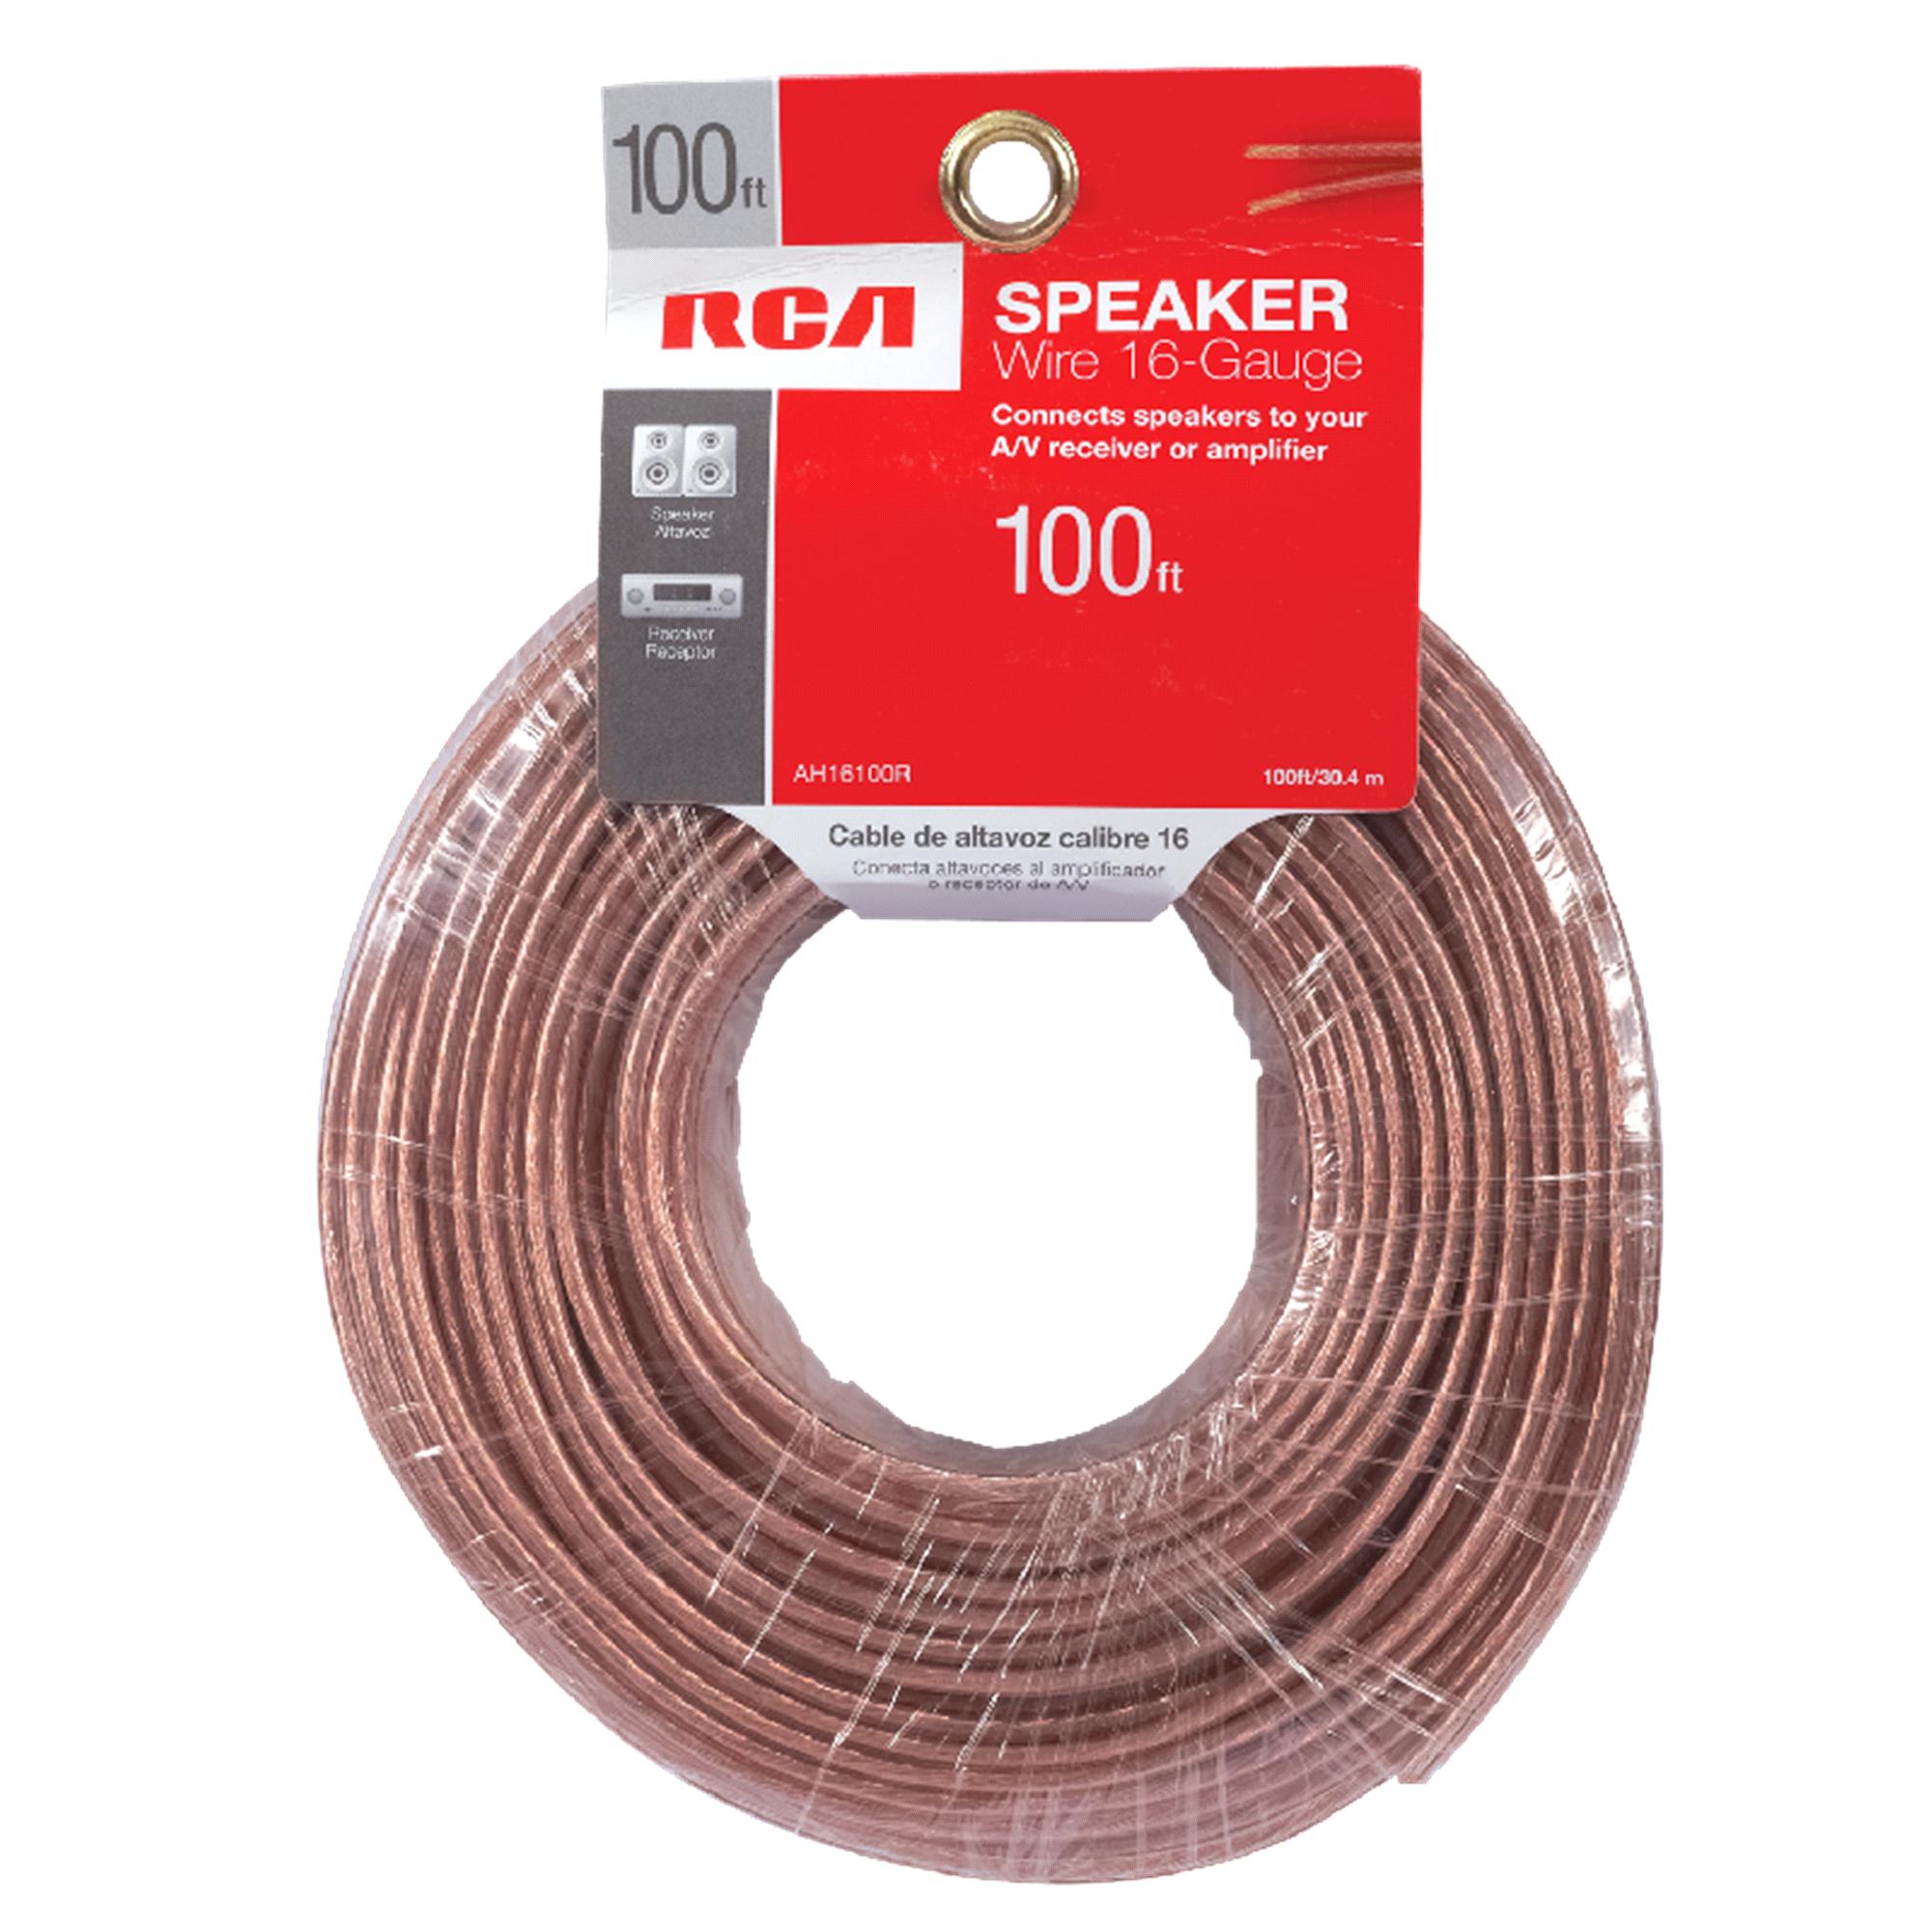 RCA 16 Gauge 100 Speaker Wire AH16100R   Meijer.com